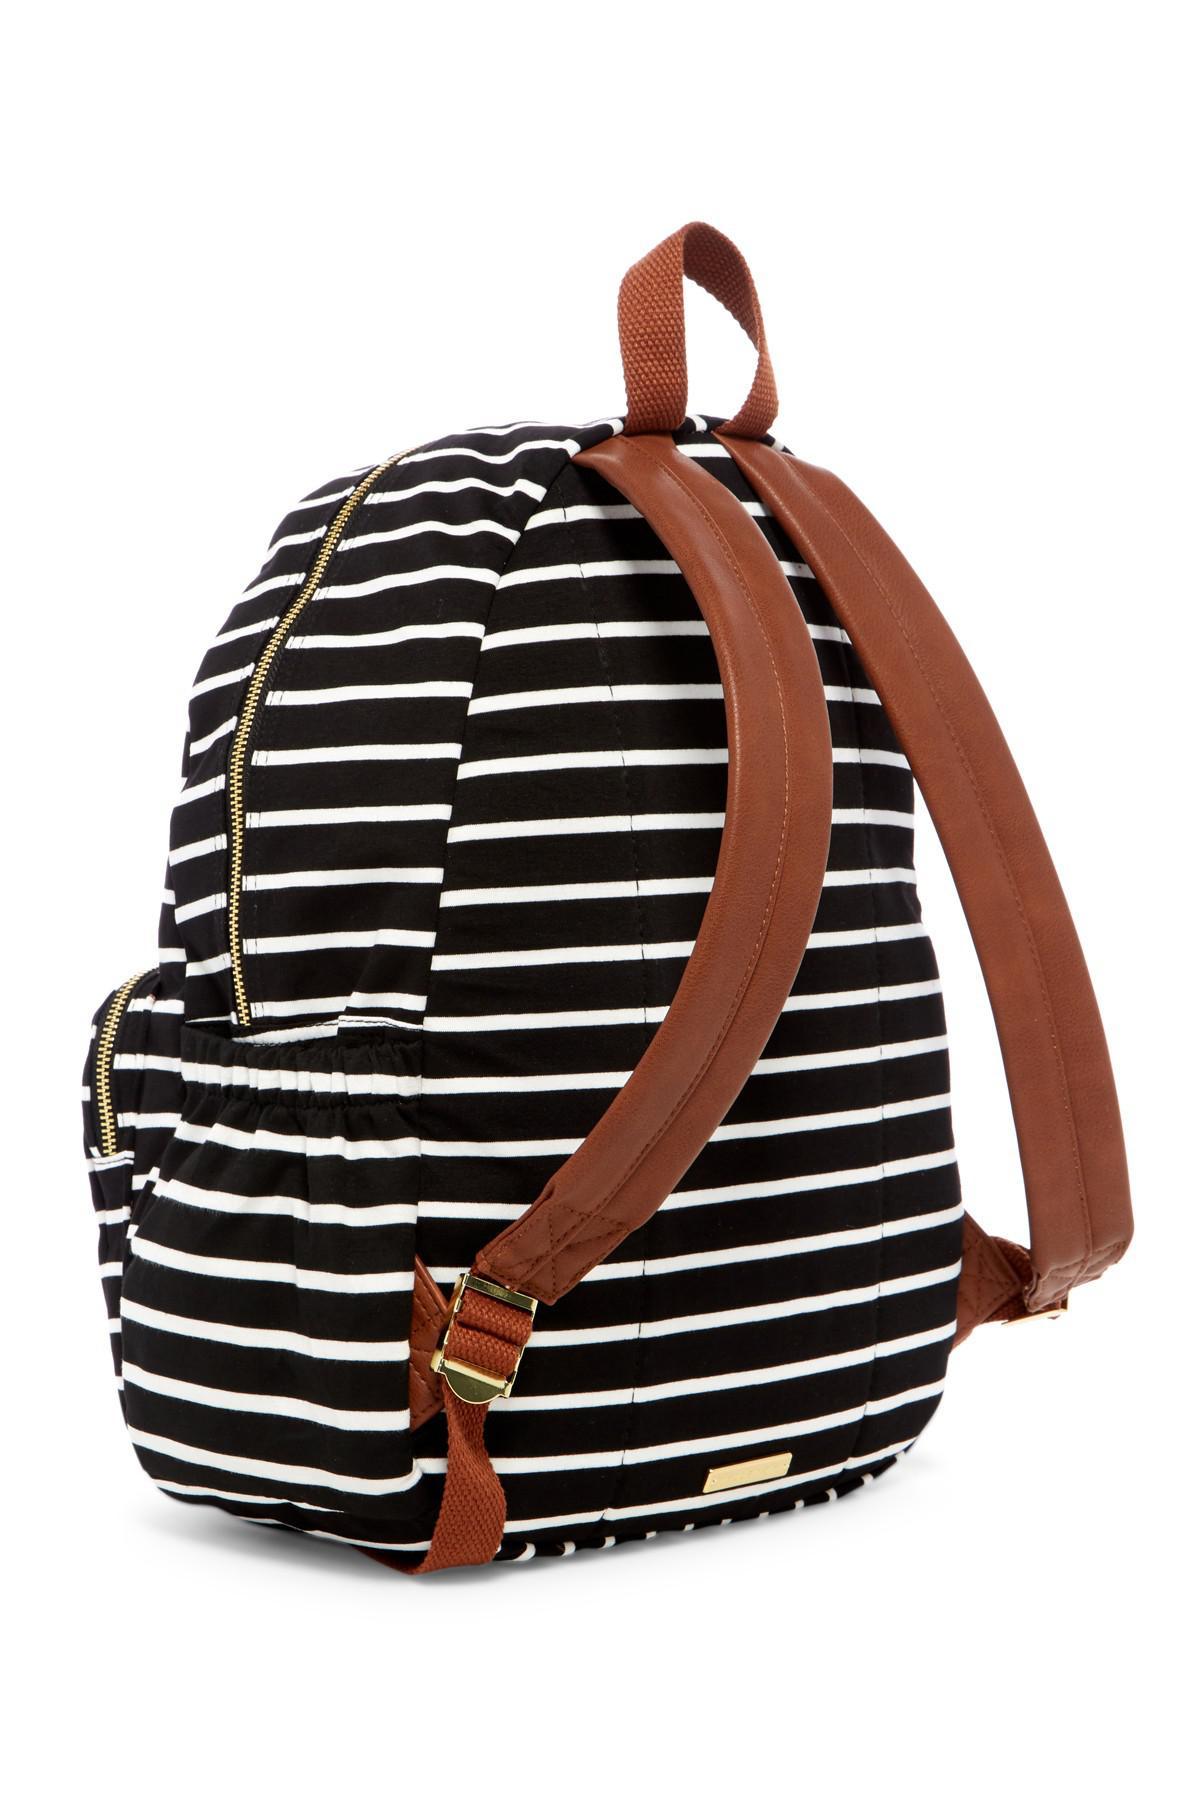 38e442a9ee1 Madden Girl Stripe Jersey Backpack in Black - Lyst